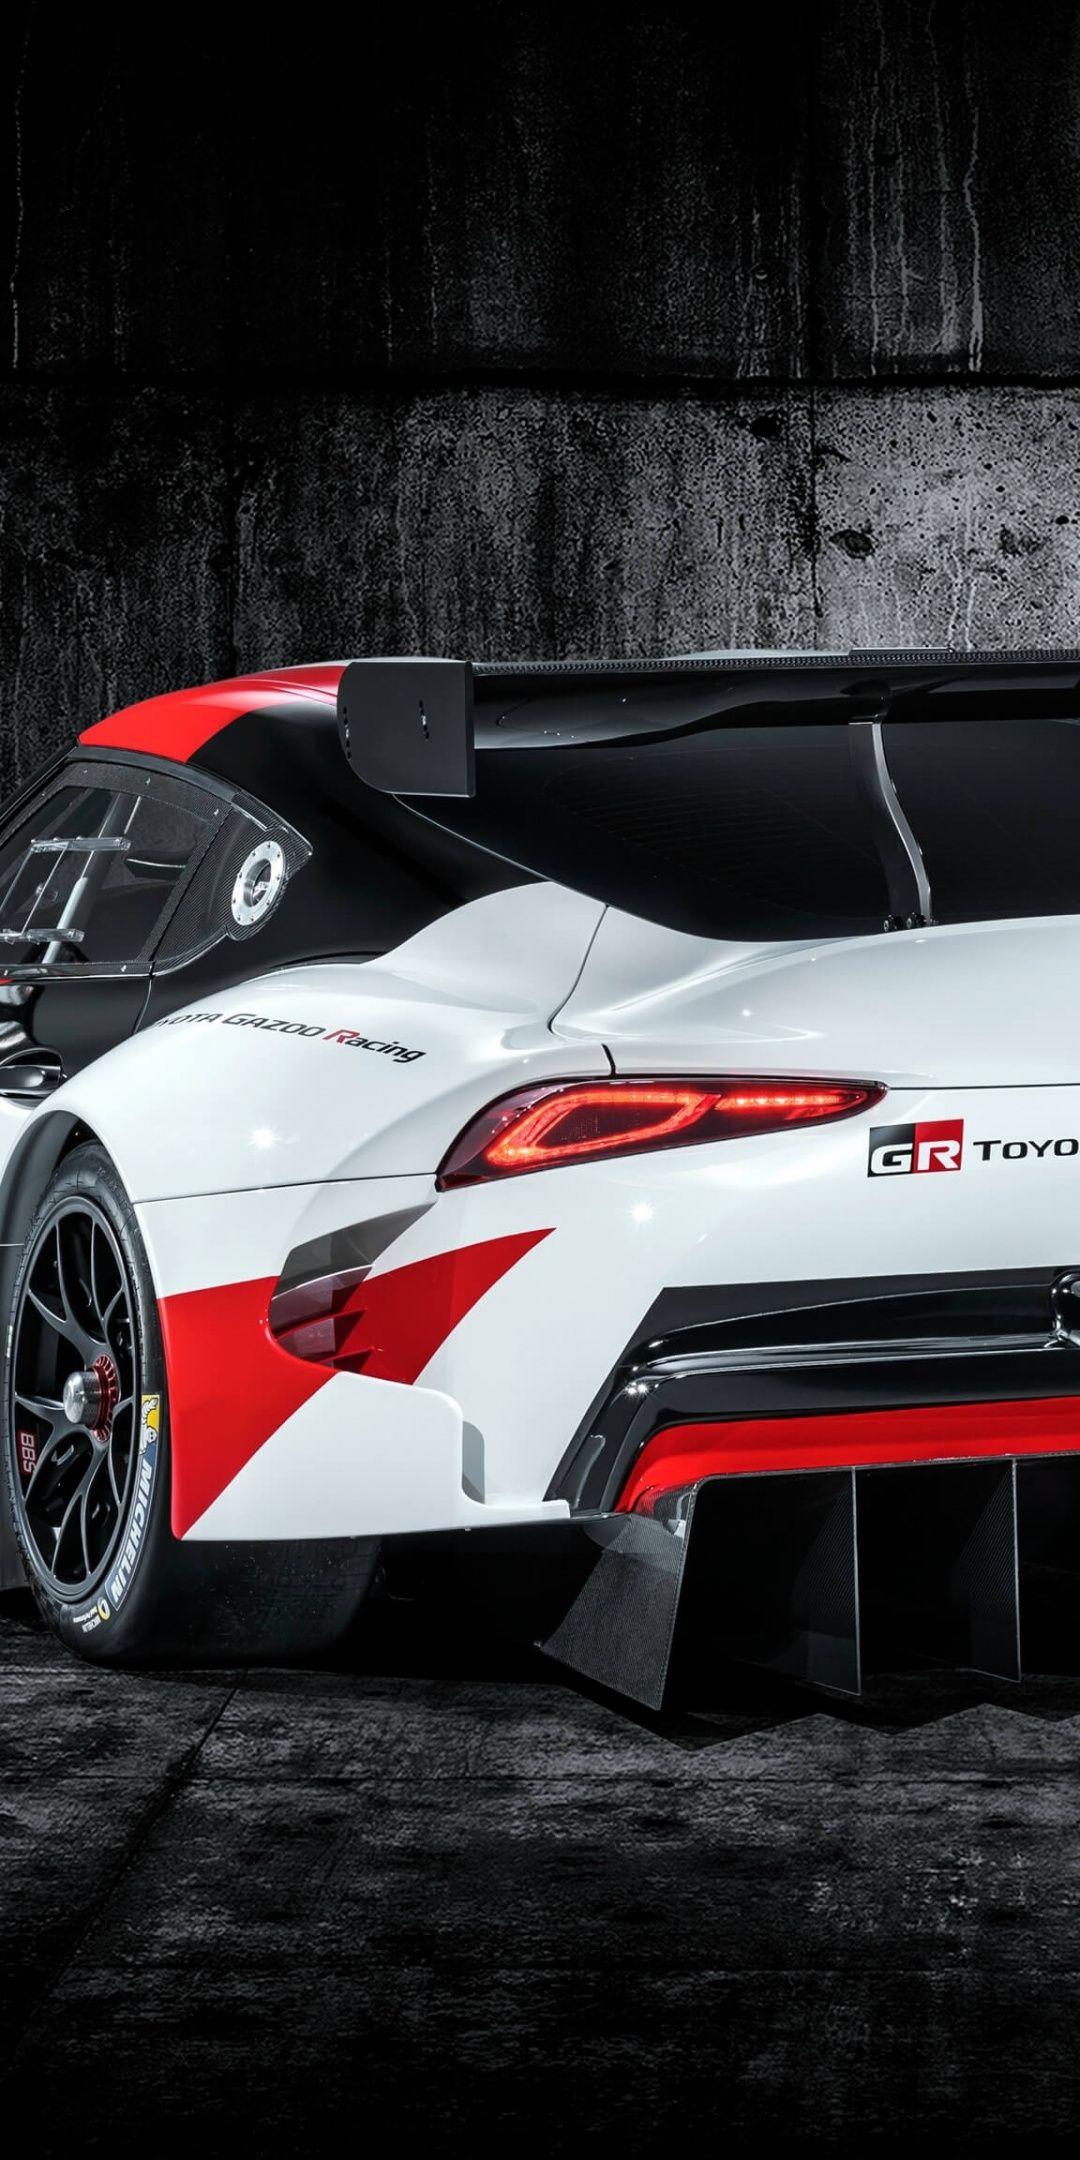 Toyota Gr Supra Sports Car Rear 2019 1080x2160 Wallpaper Sports Car Toyota Car